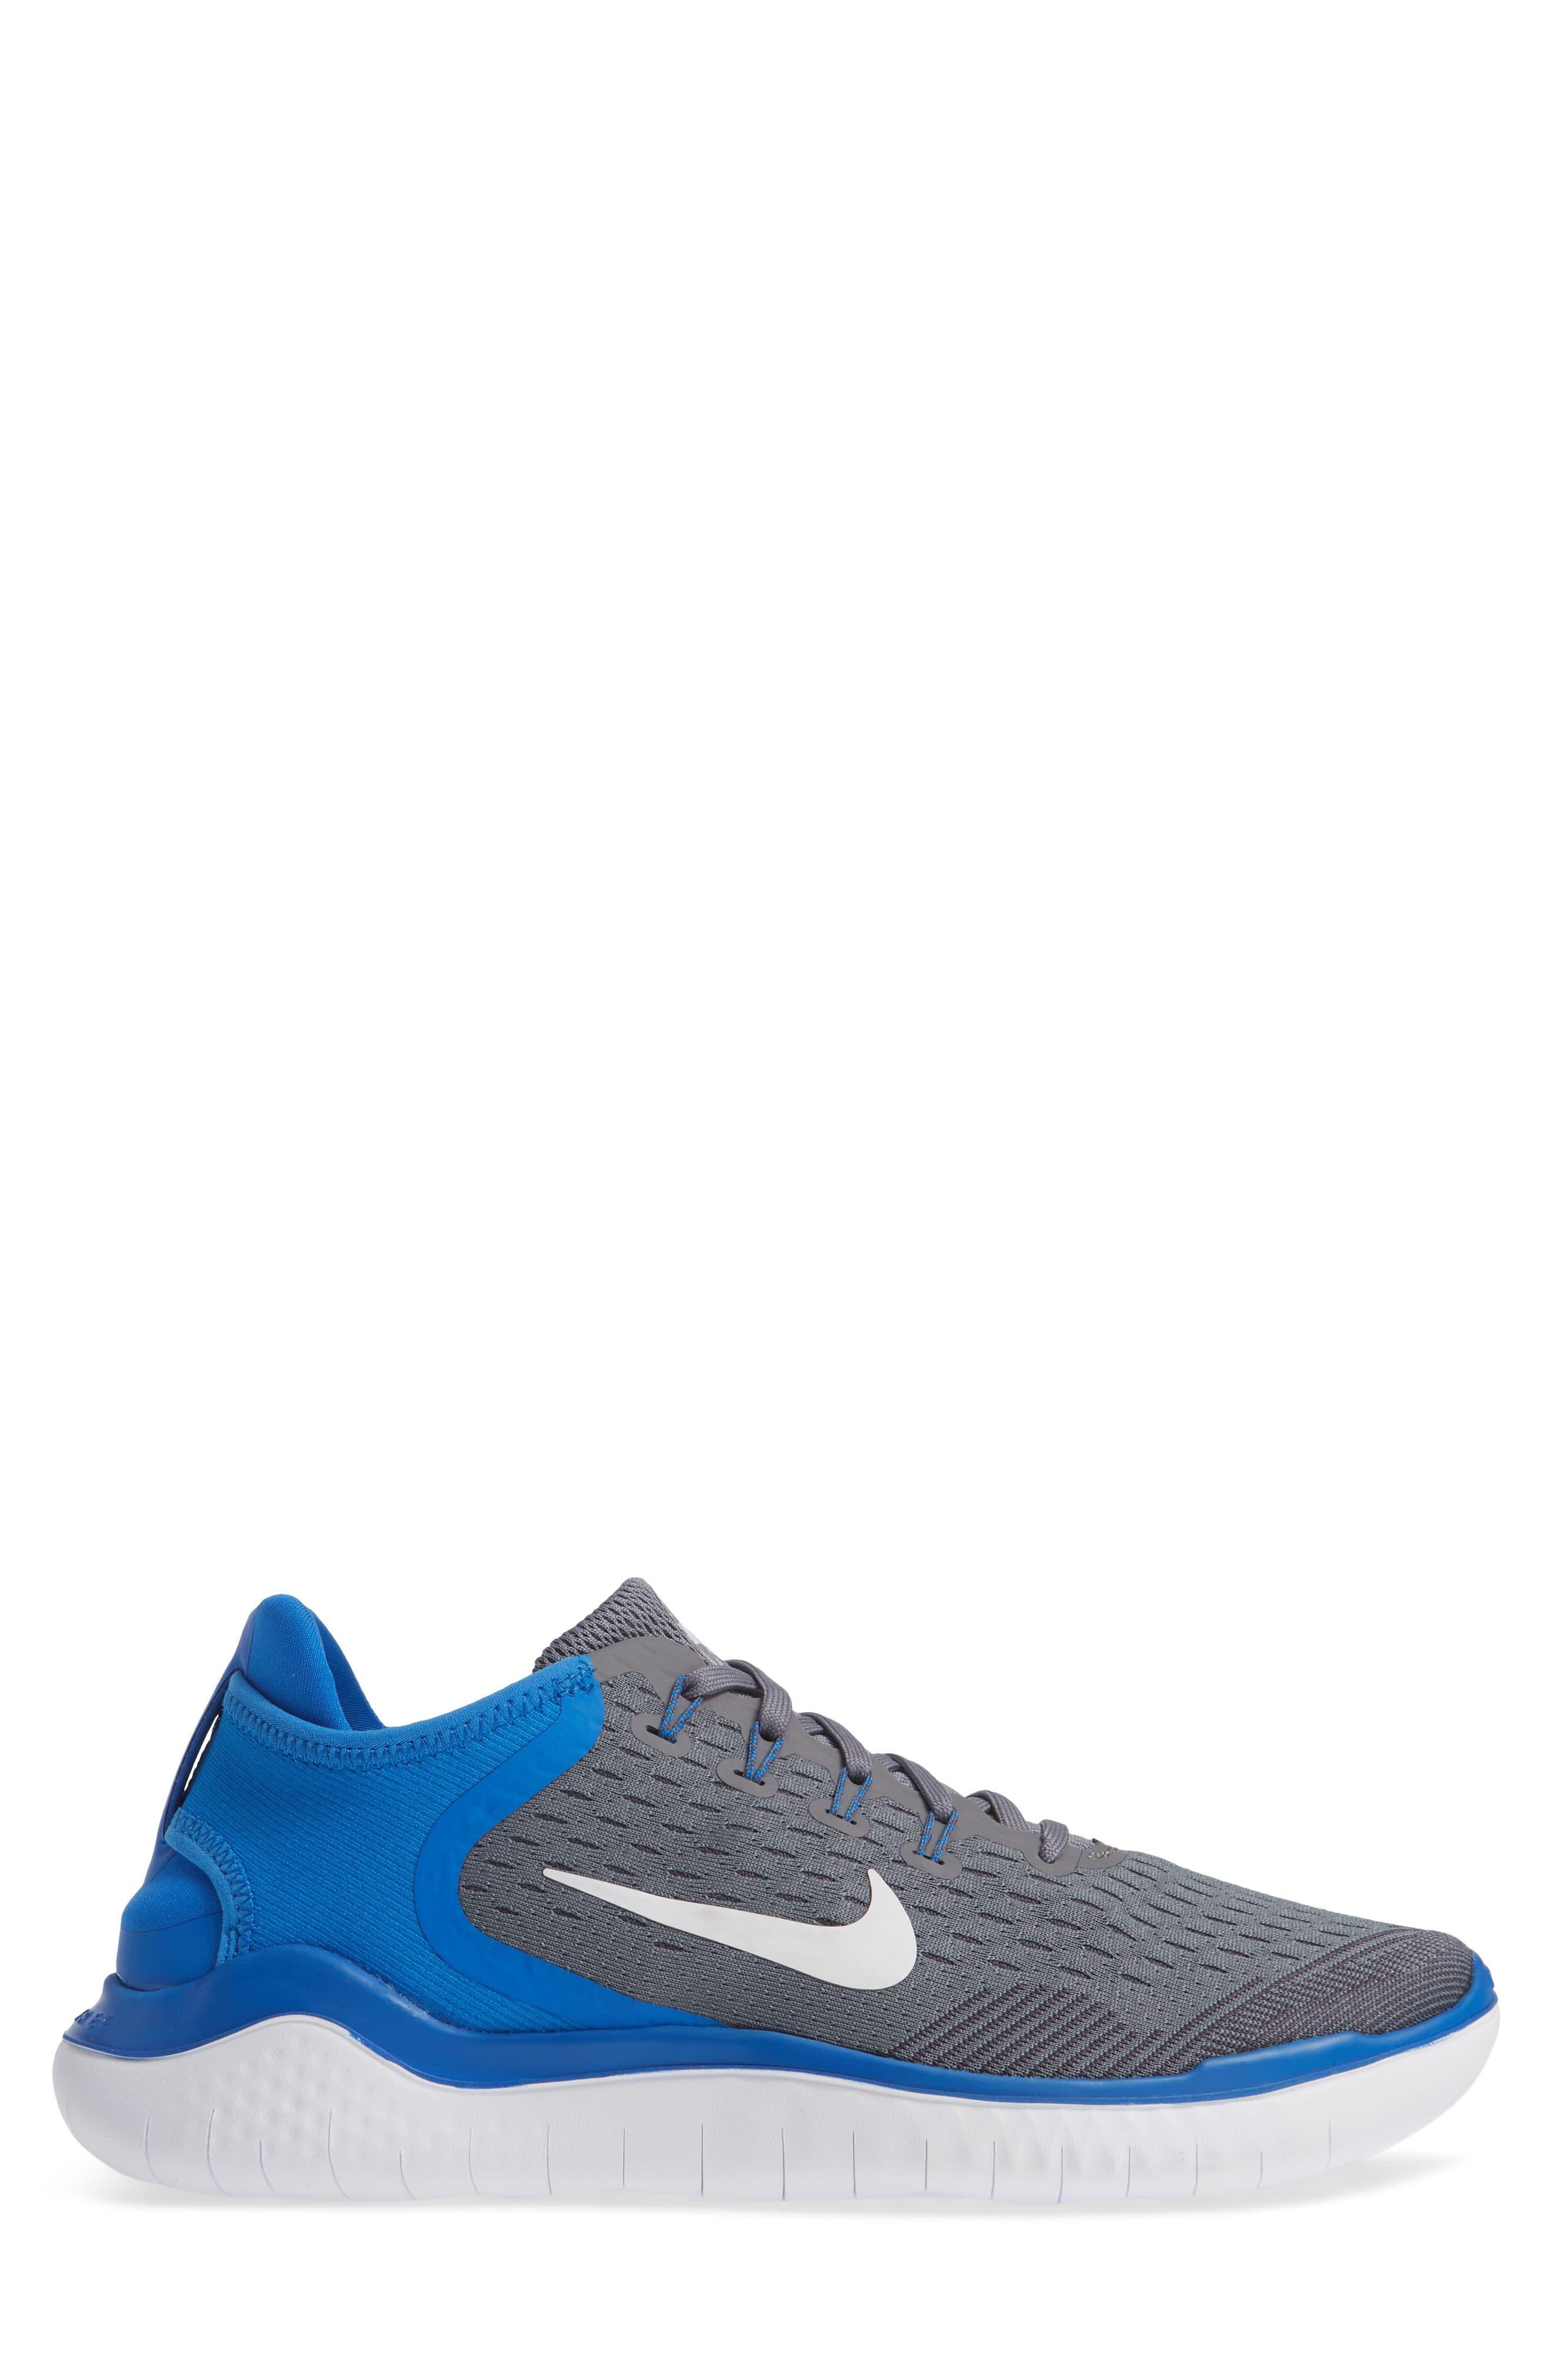 Free RN 2018 Running Shoe,                             Alternate thumbnail 5, color,                             Gunsmoke/ White/ Blue